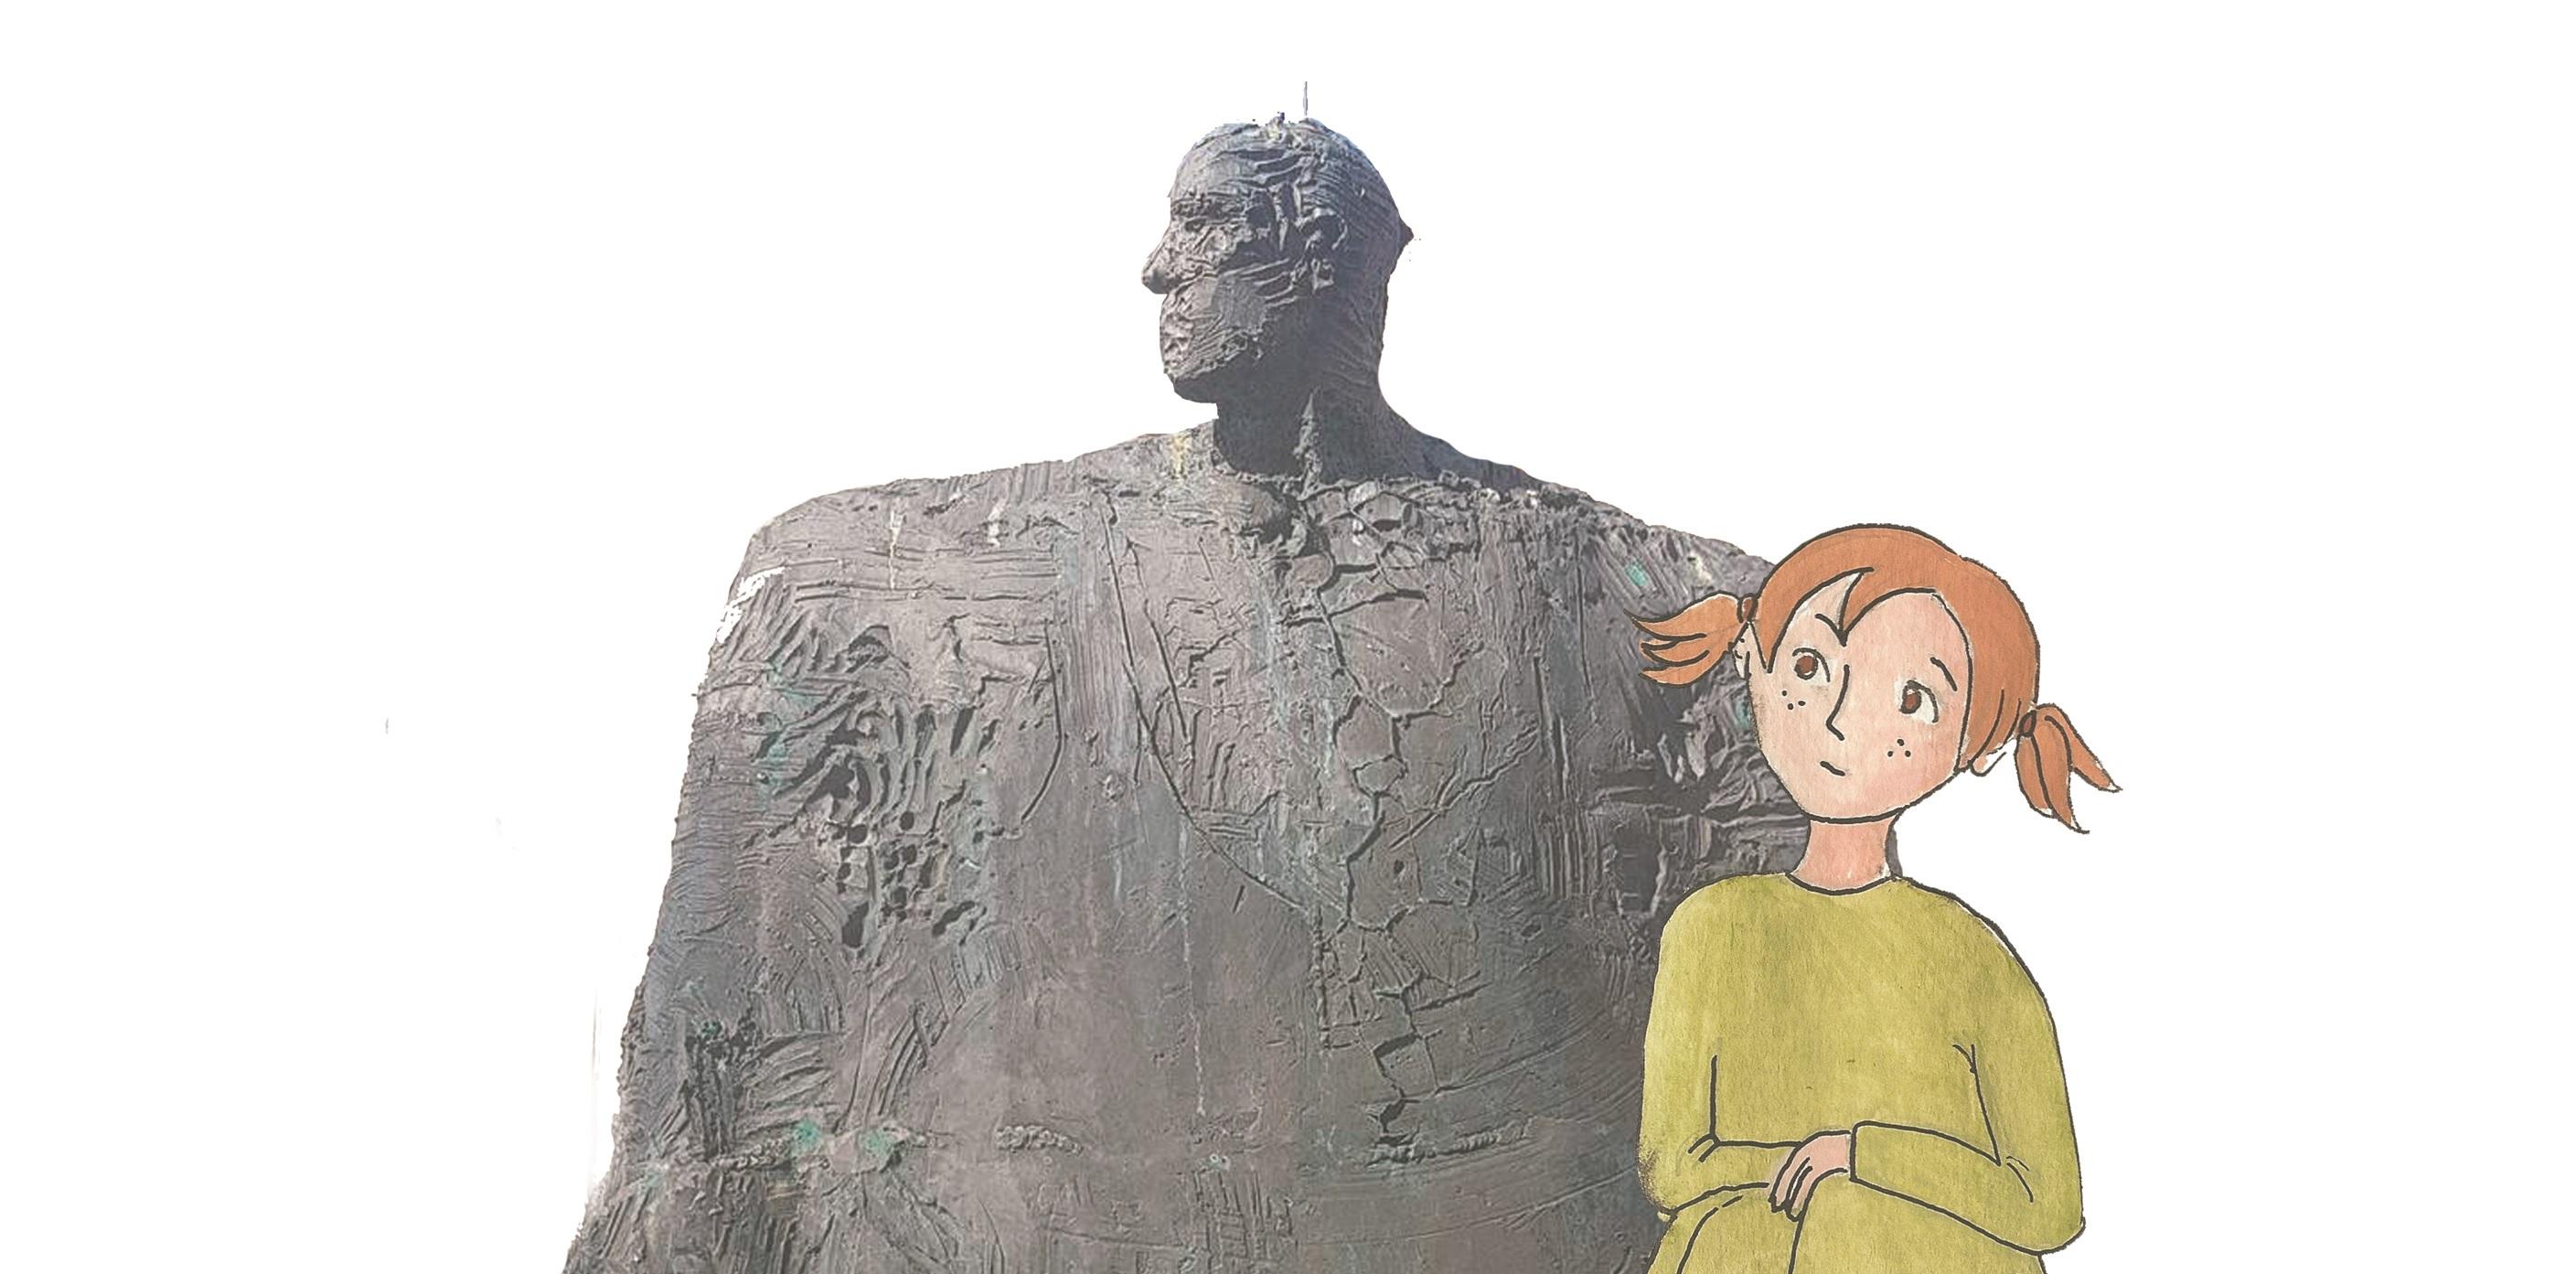 Borgny-Bokkeren-Statue-Alesund-Guiding-historie-Voice-Norway